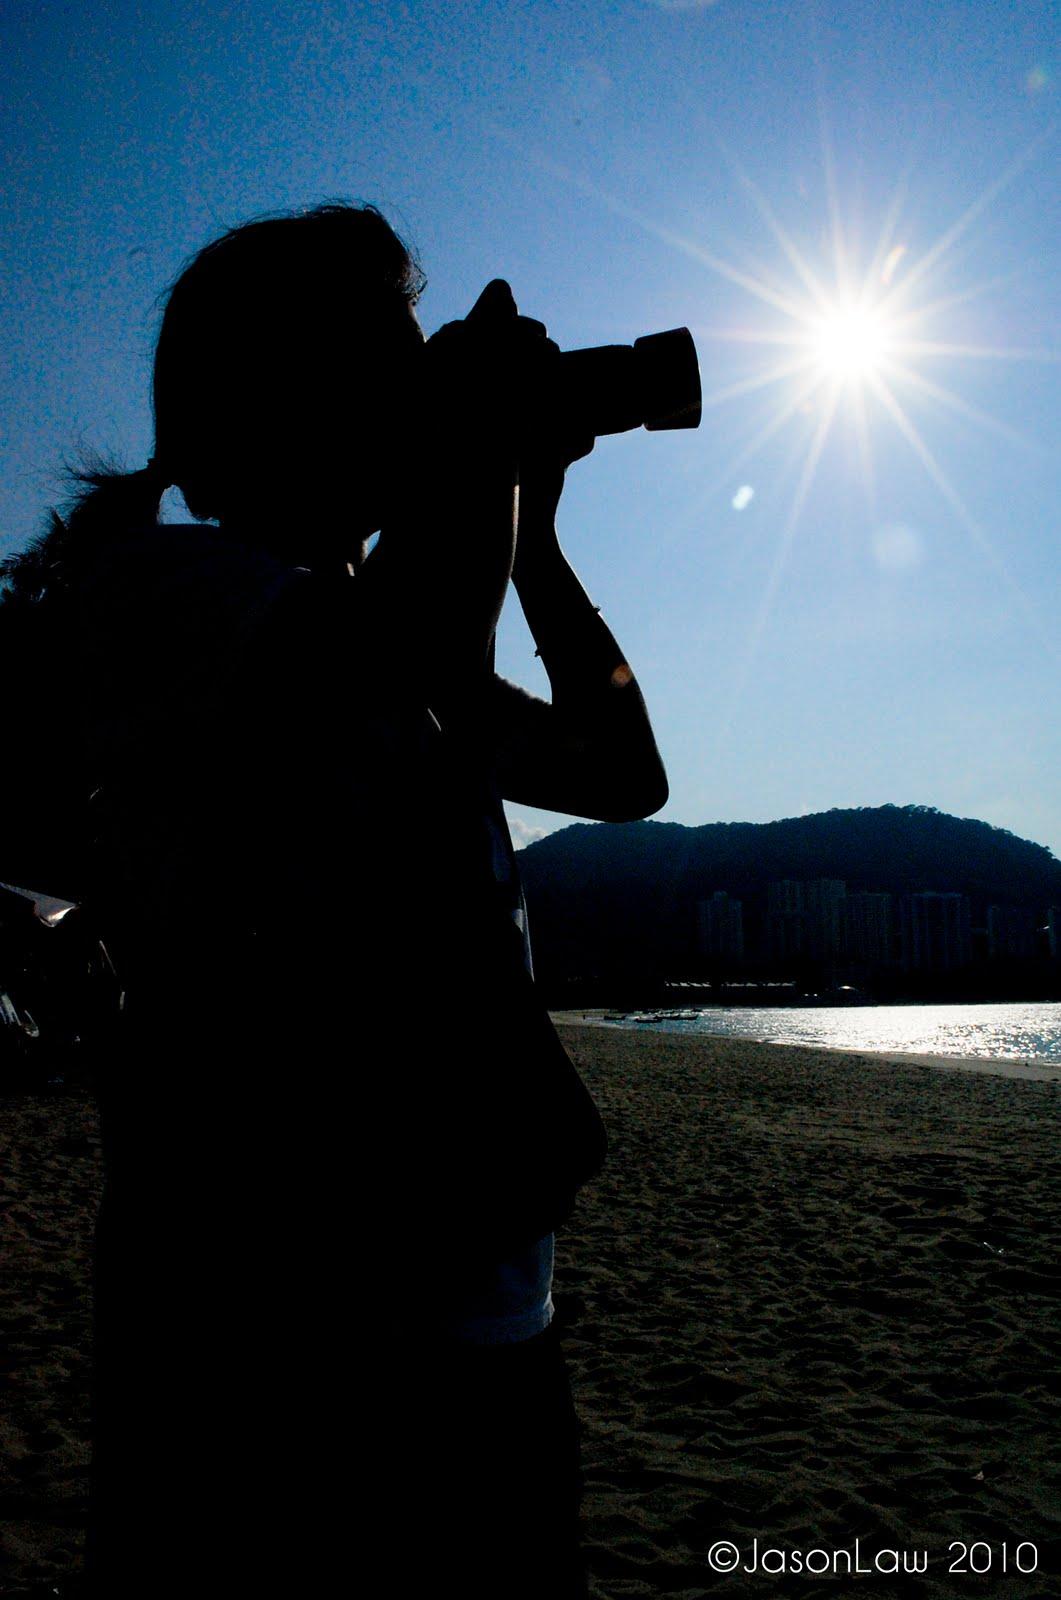 http://2.bp.blogspot.com/_4i5HngzV2GE/S8NDnGzgcNI/AAAAAAAABFQ/SB5kEEjzWHU/s1600/Ewe+Shen+Sun.jpg